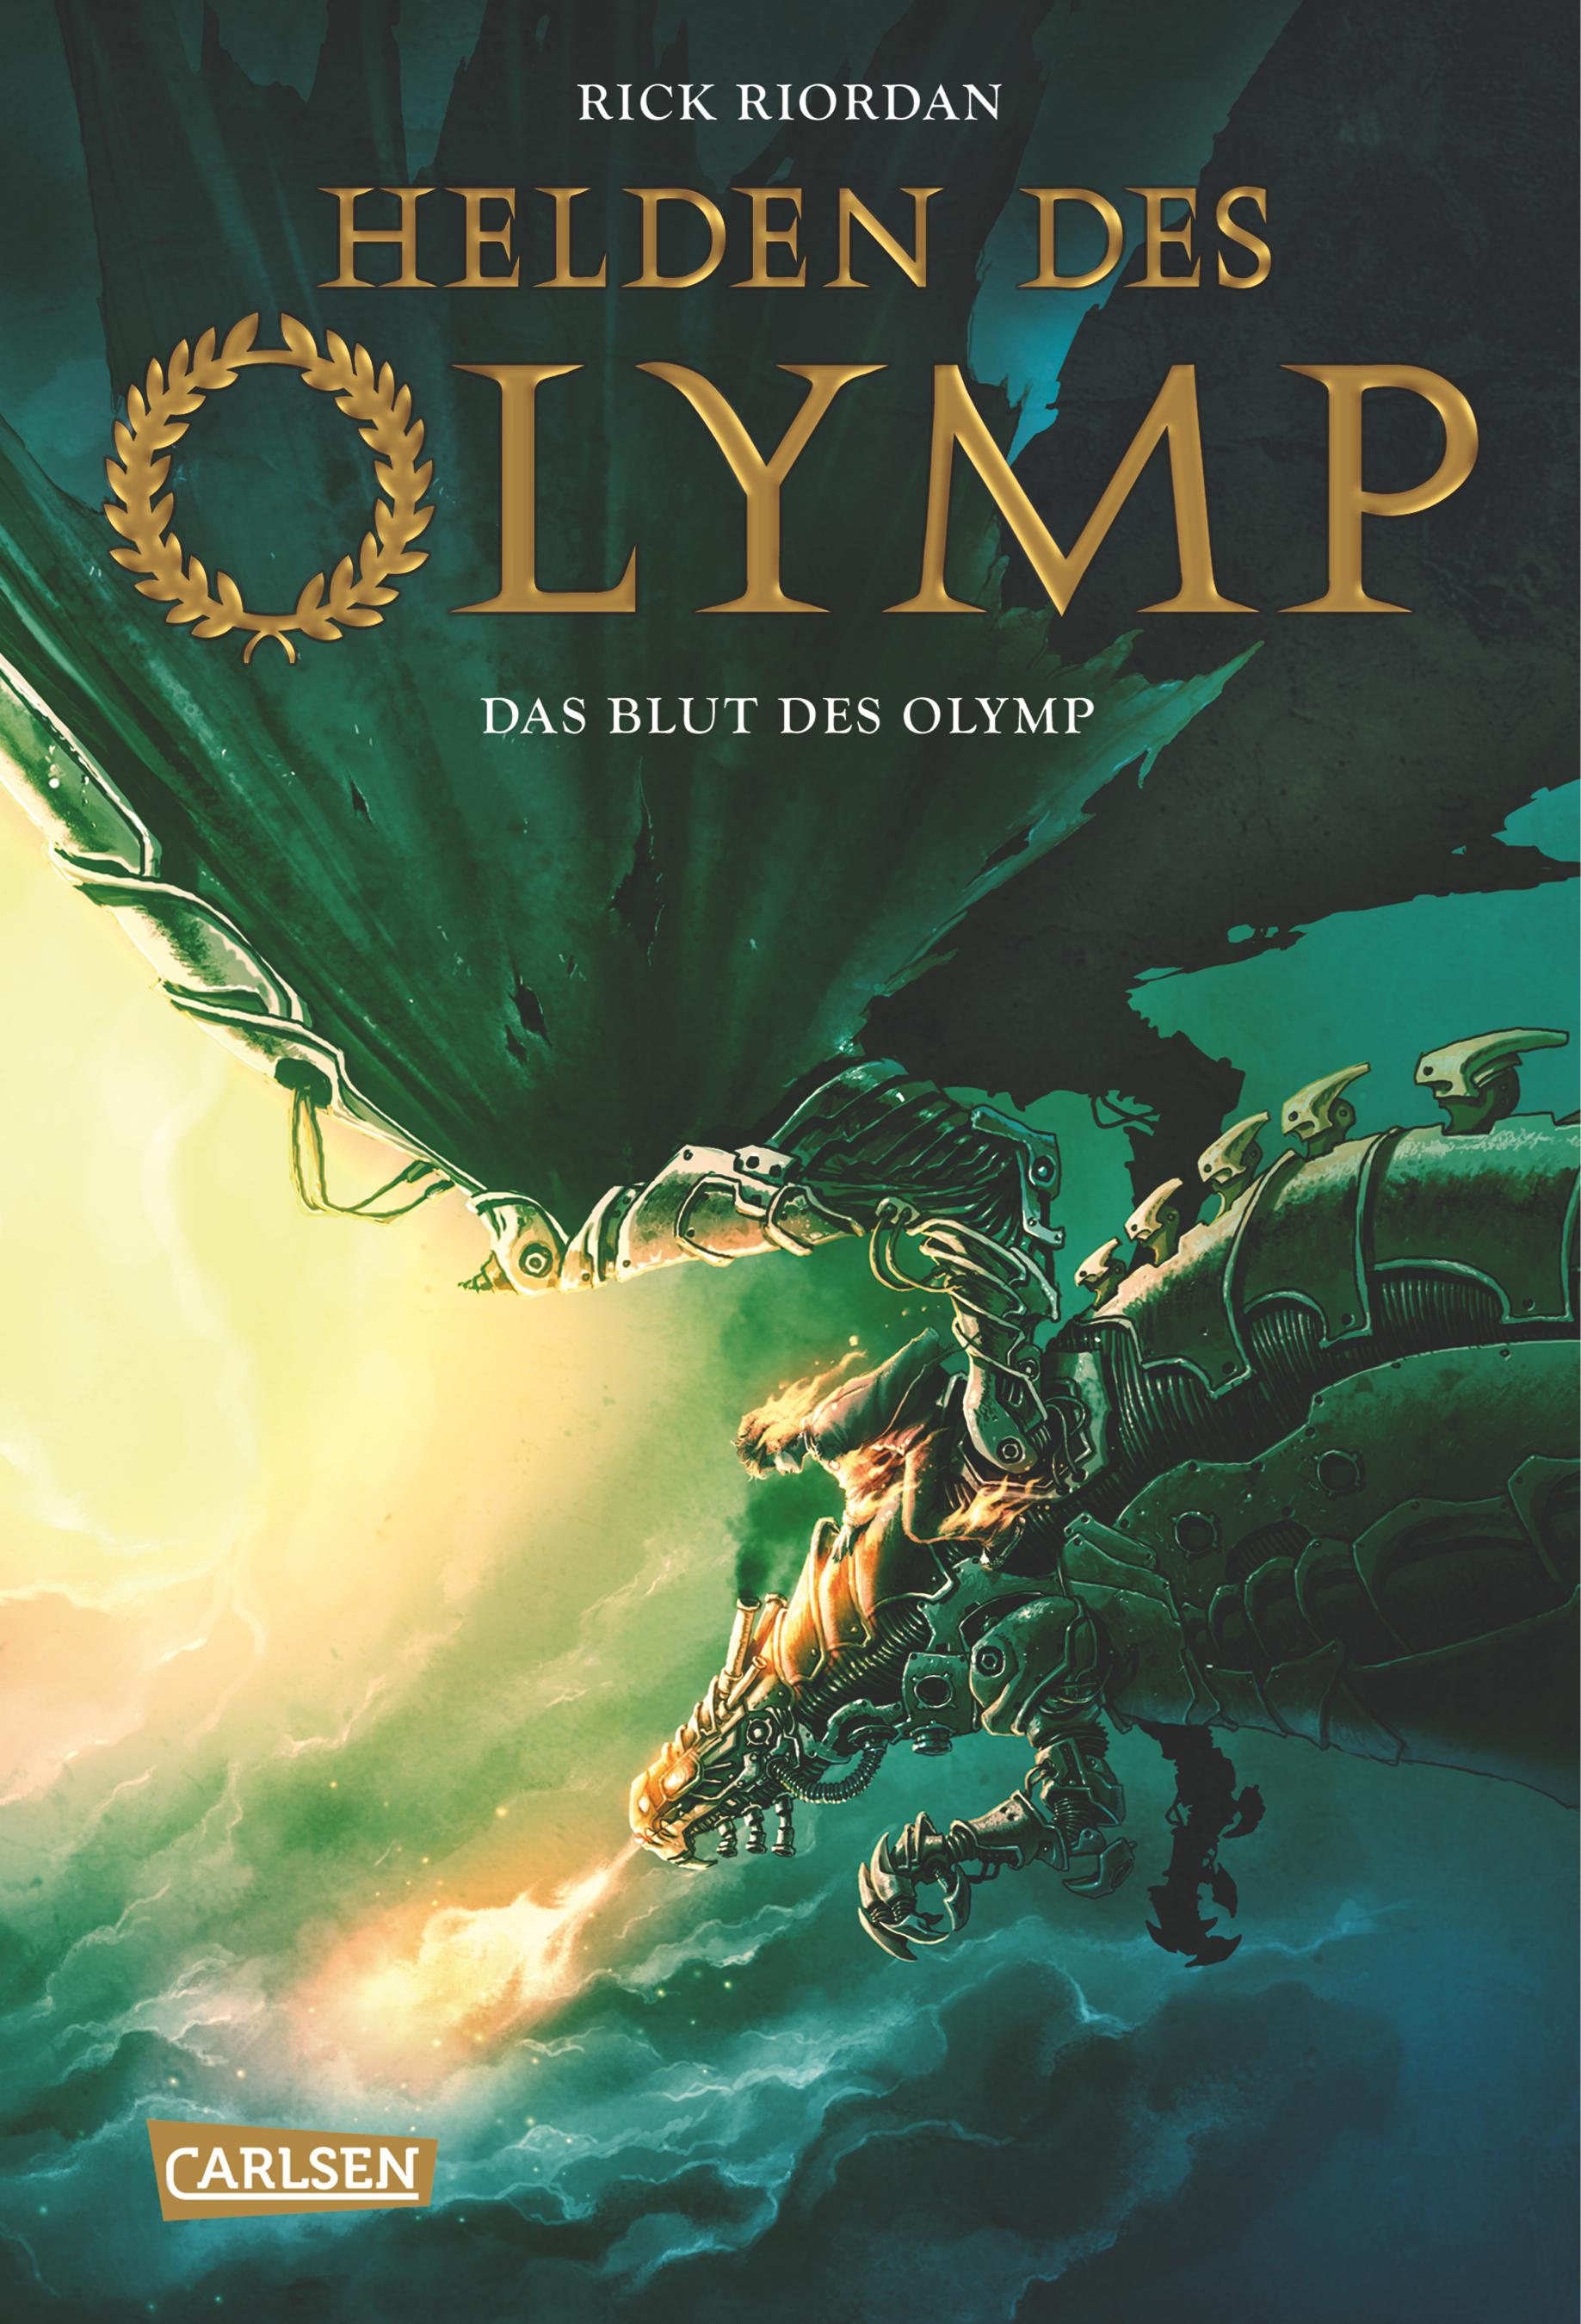 Helden des Olymp: Band 5 - Das Blut des Olymp - Rick Riordan